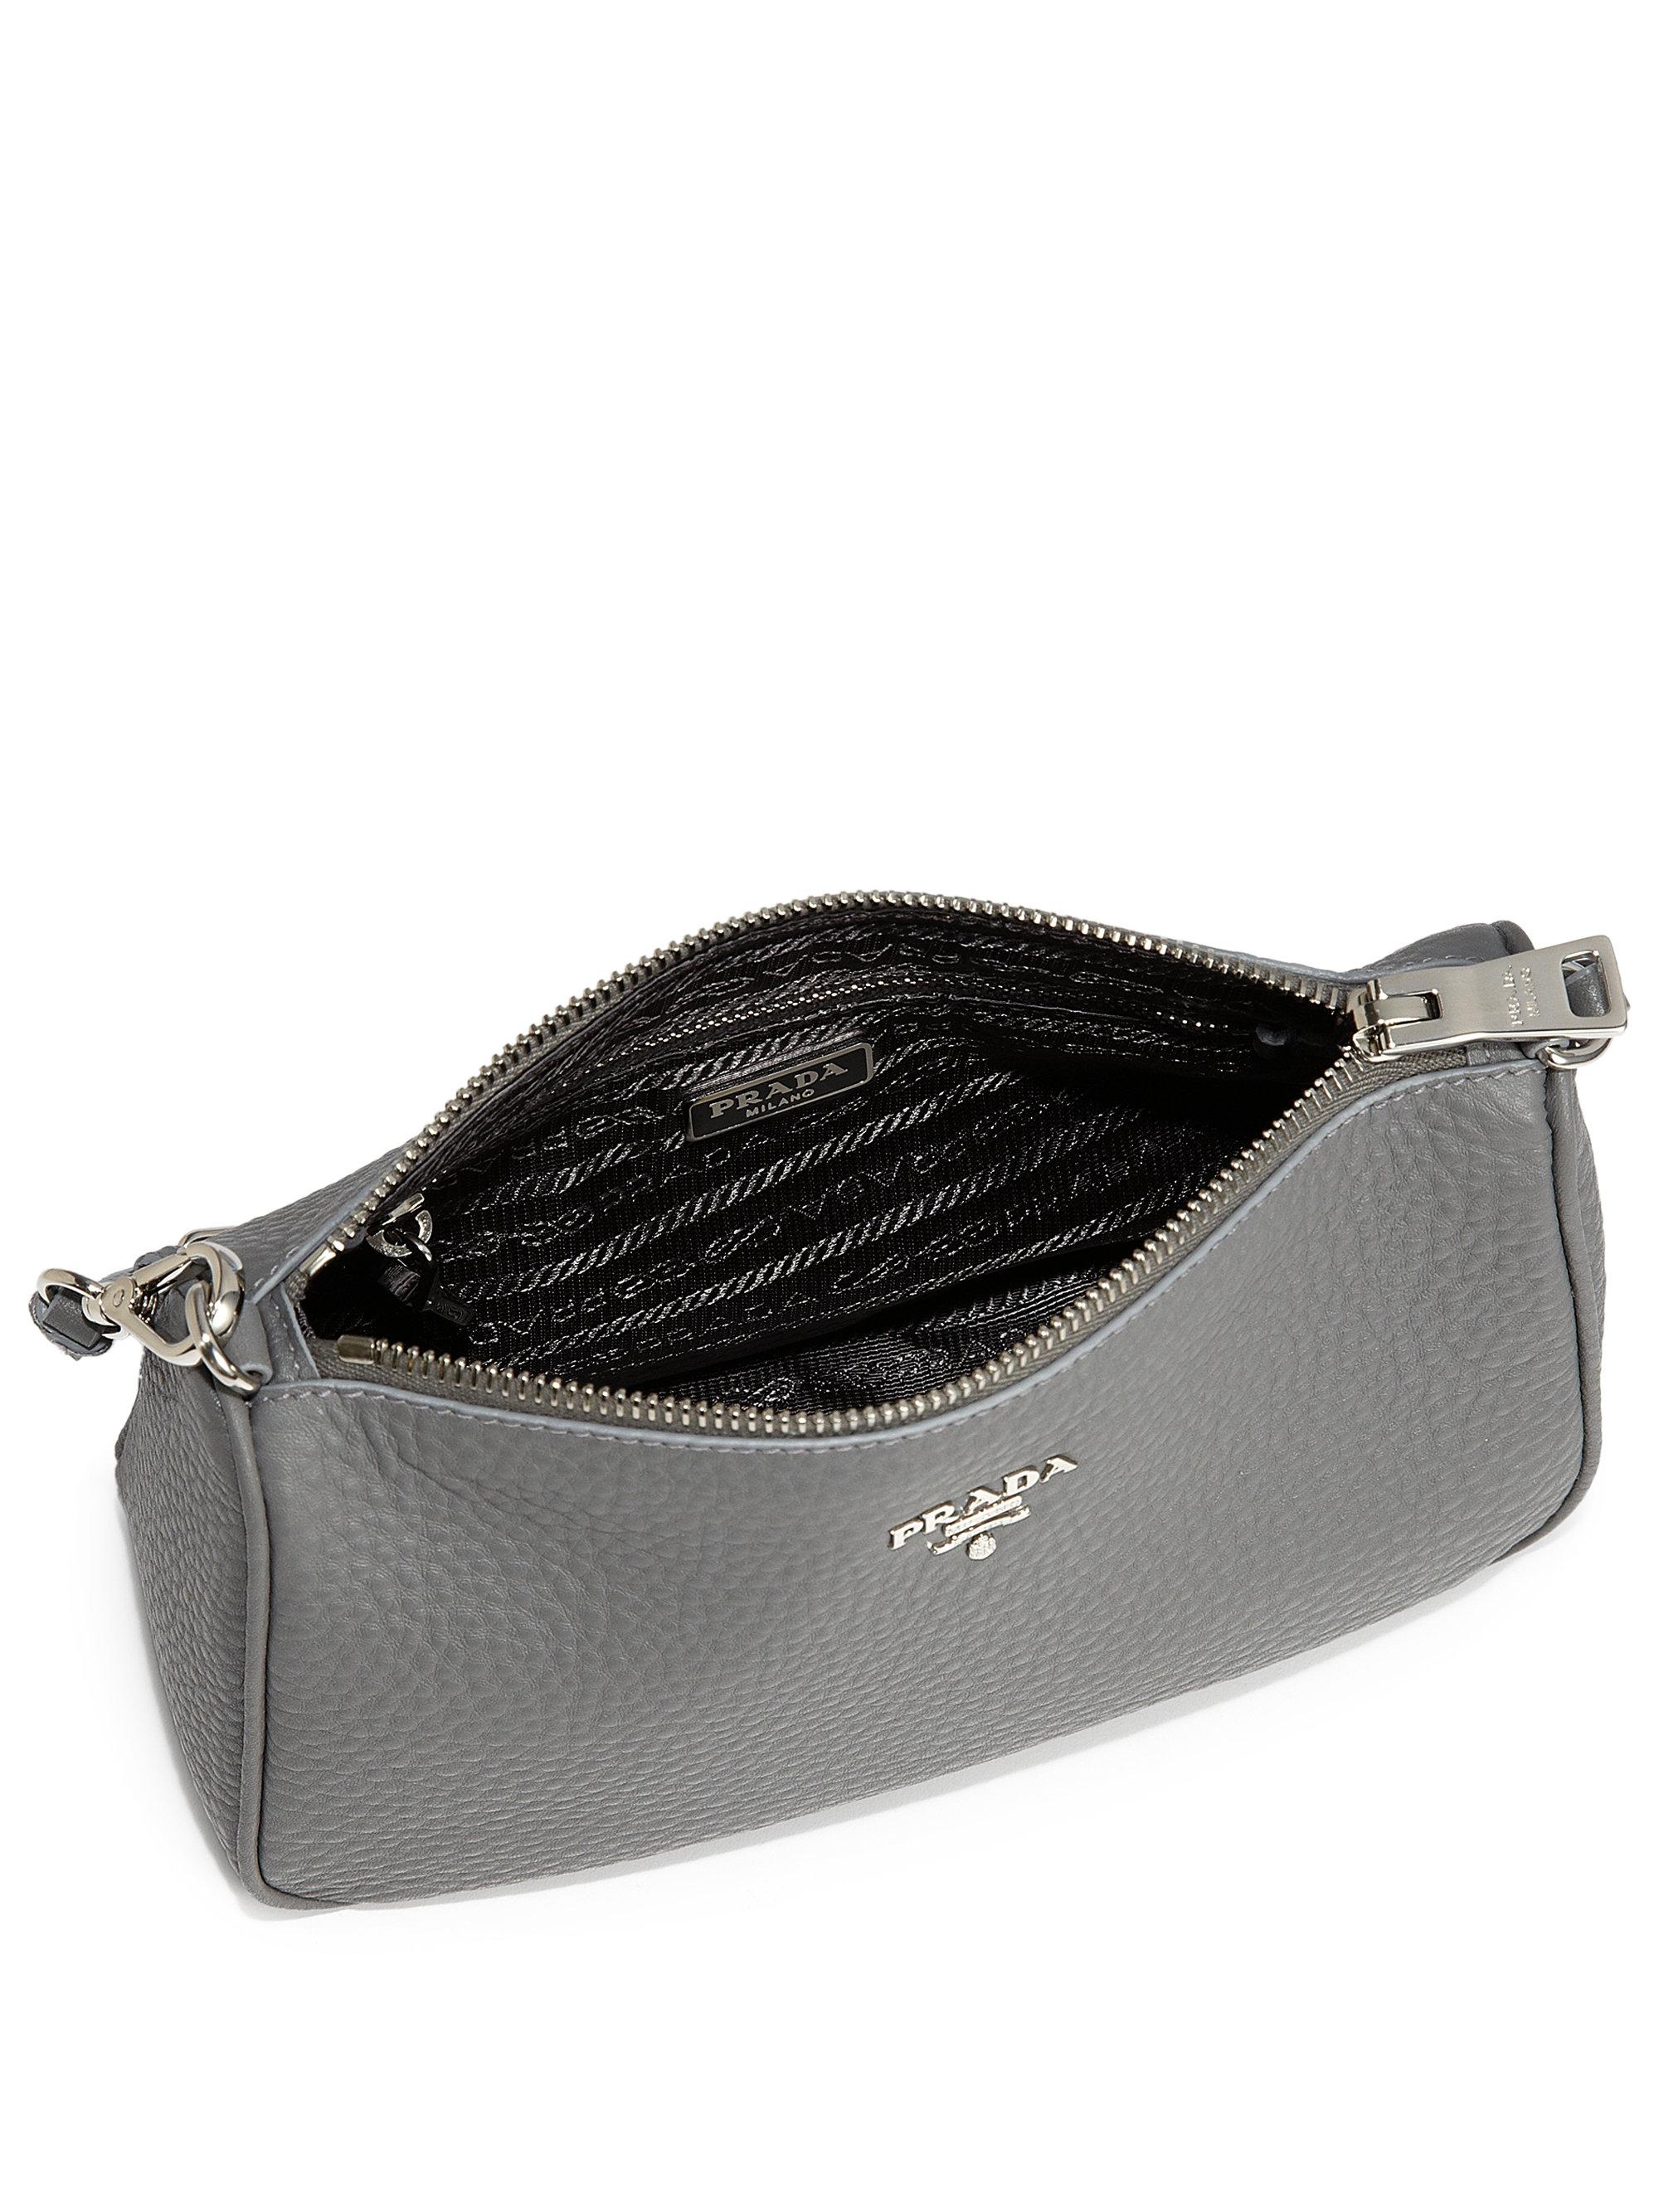 prada silver purse - Prada Daino Mini Hobo in Gray (GREY) | Lyst